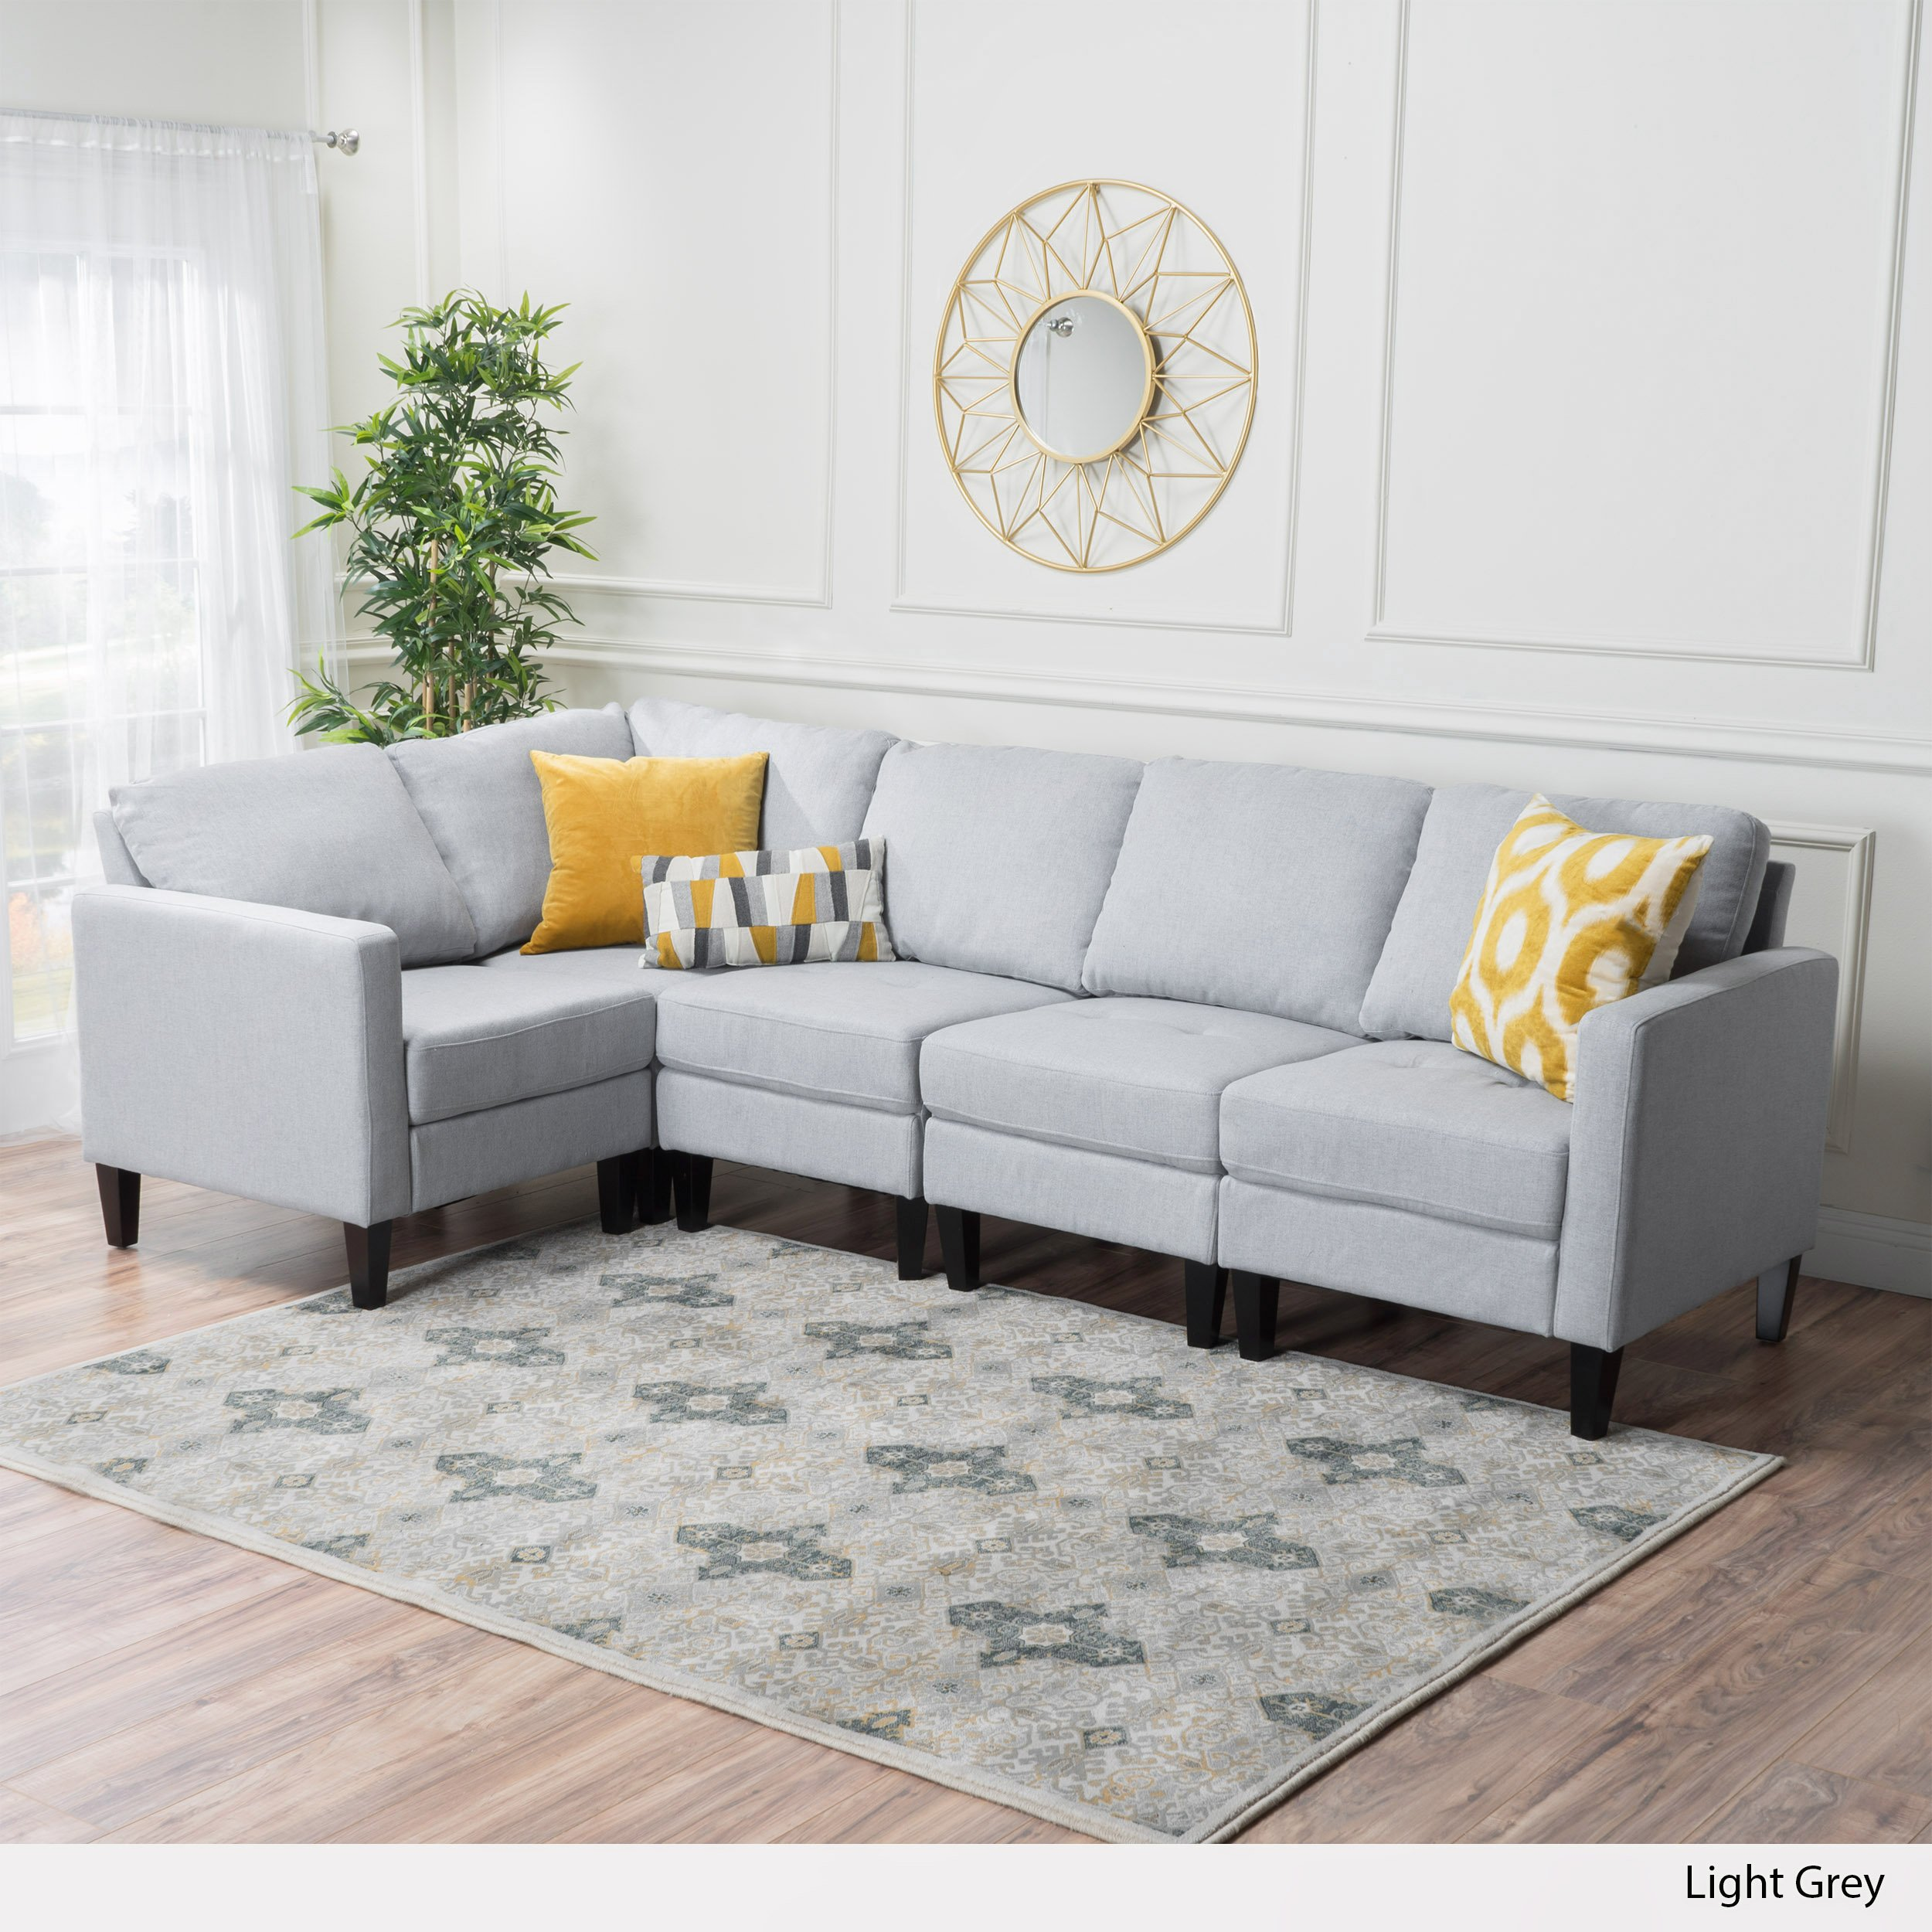 Sectional Gray Sofa Set: Carolina Sectional Sofa Set, 5-Piece Living Room Furniture